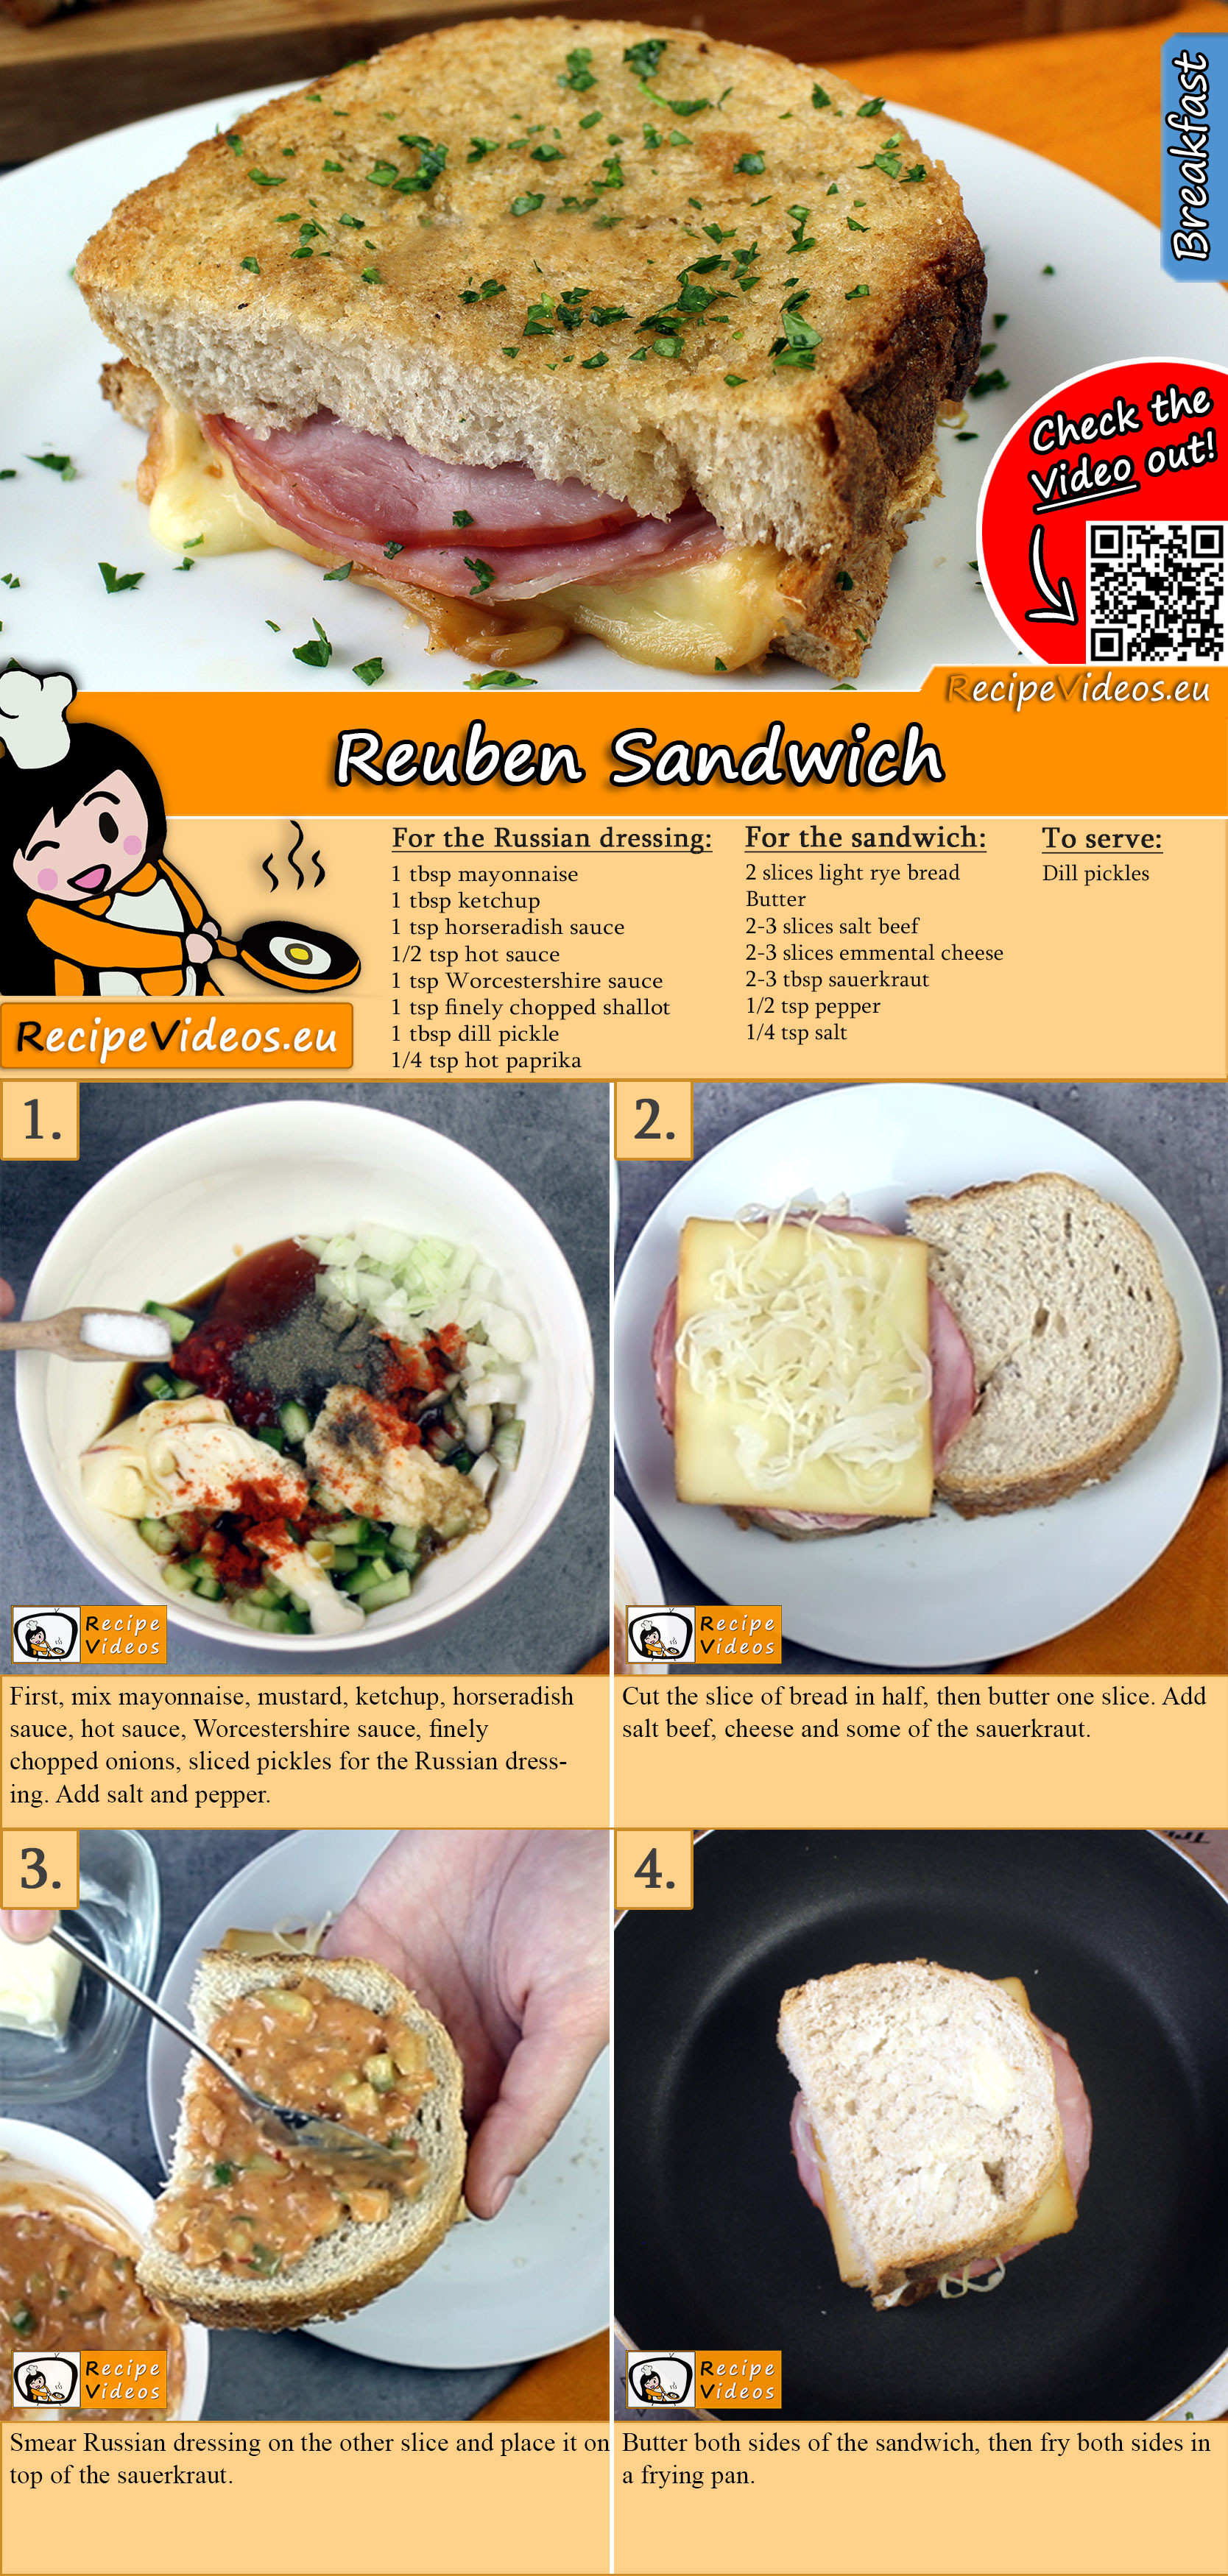 Reuben Sandwich recipe with video